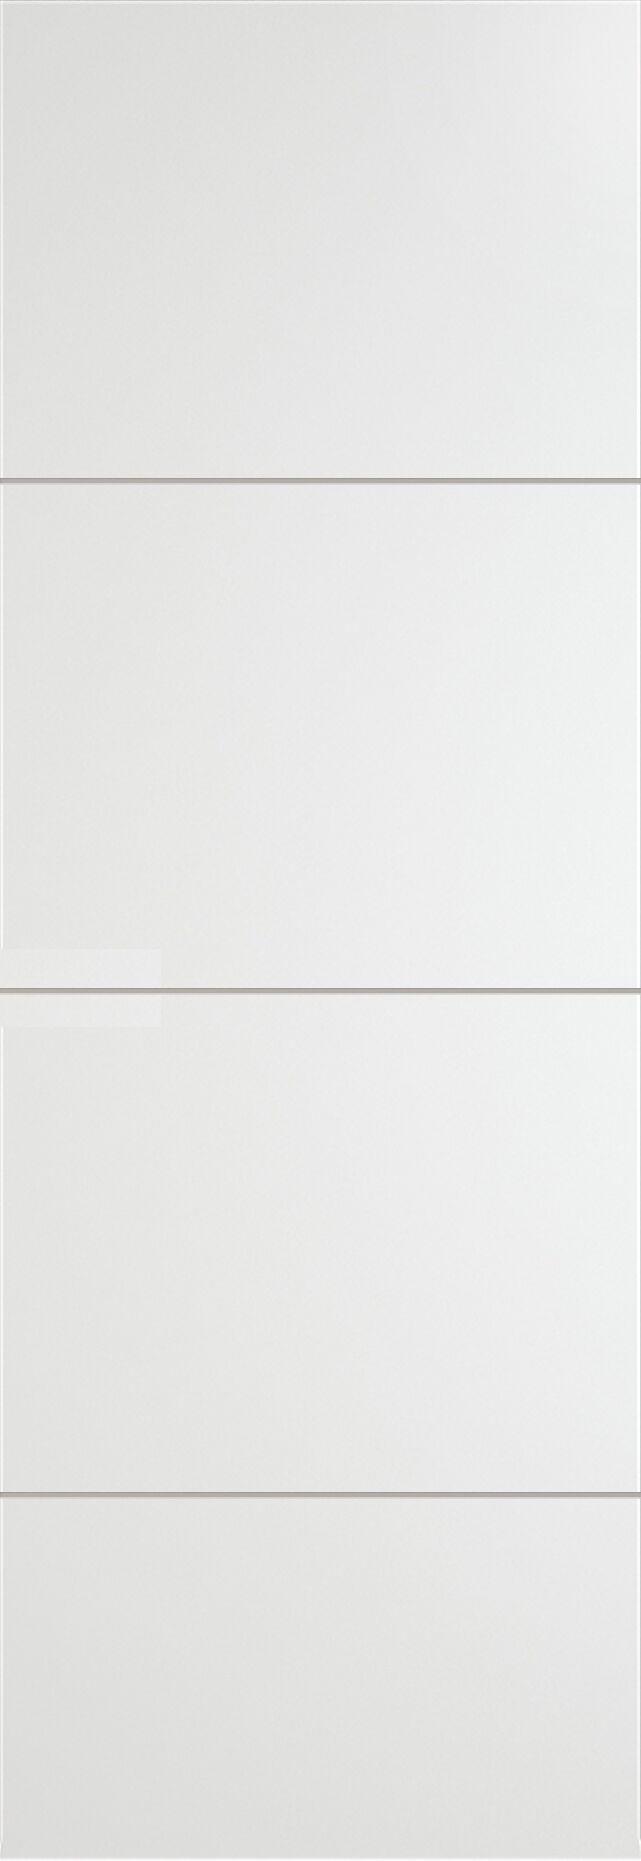 Tivoli Г-2 Invisible цвет - Белая эмаль Без стекла (ДГ)